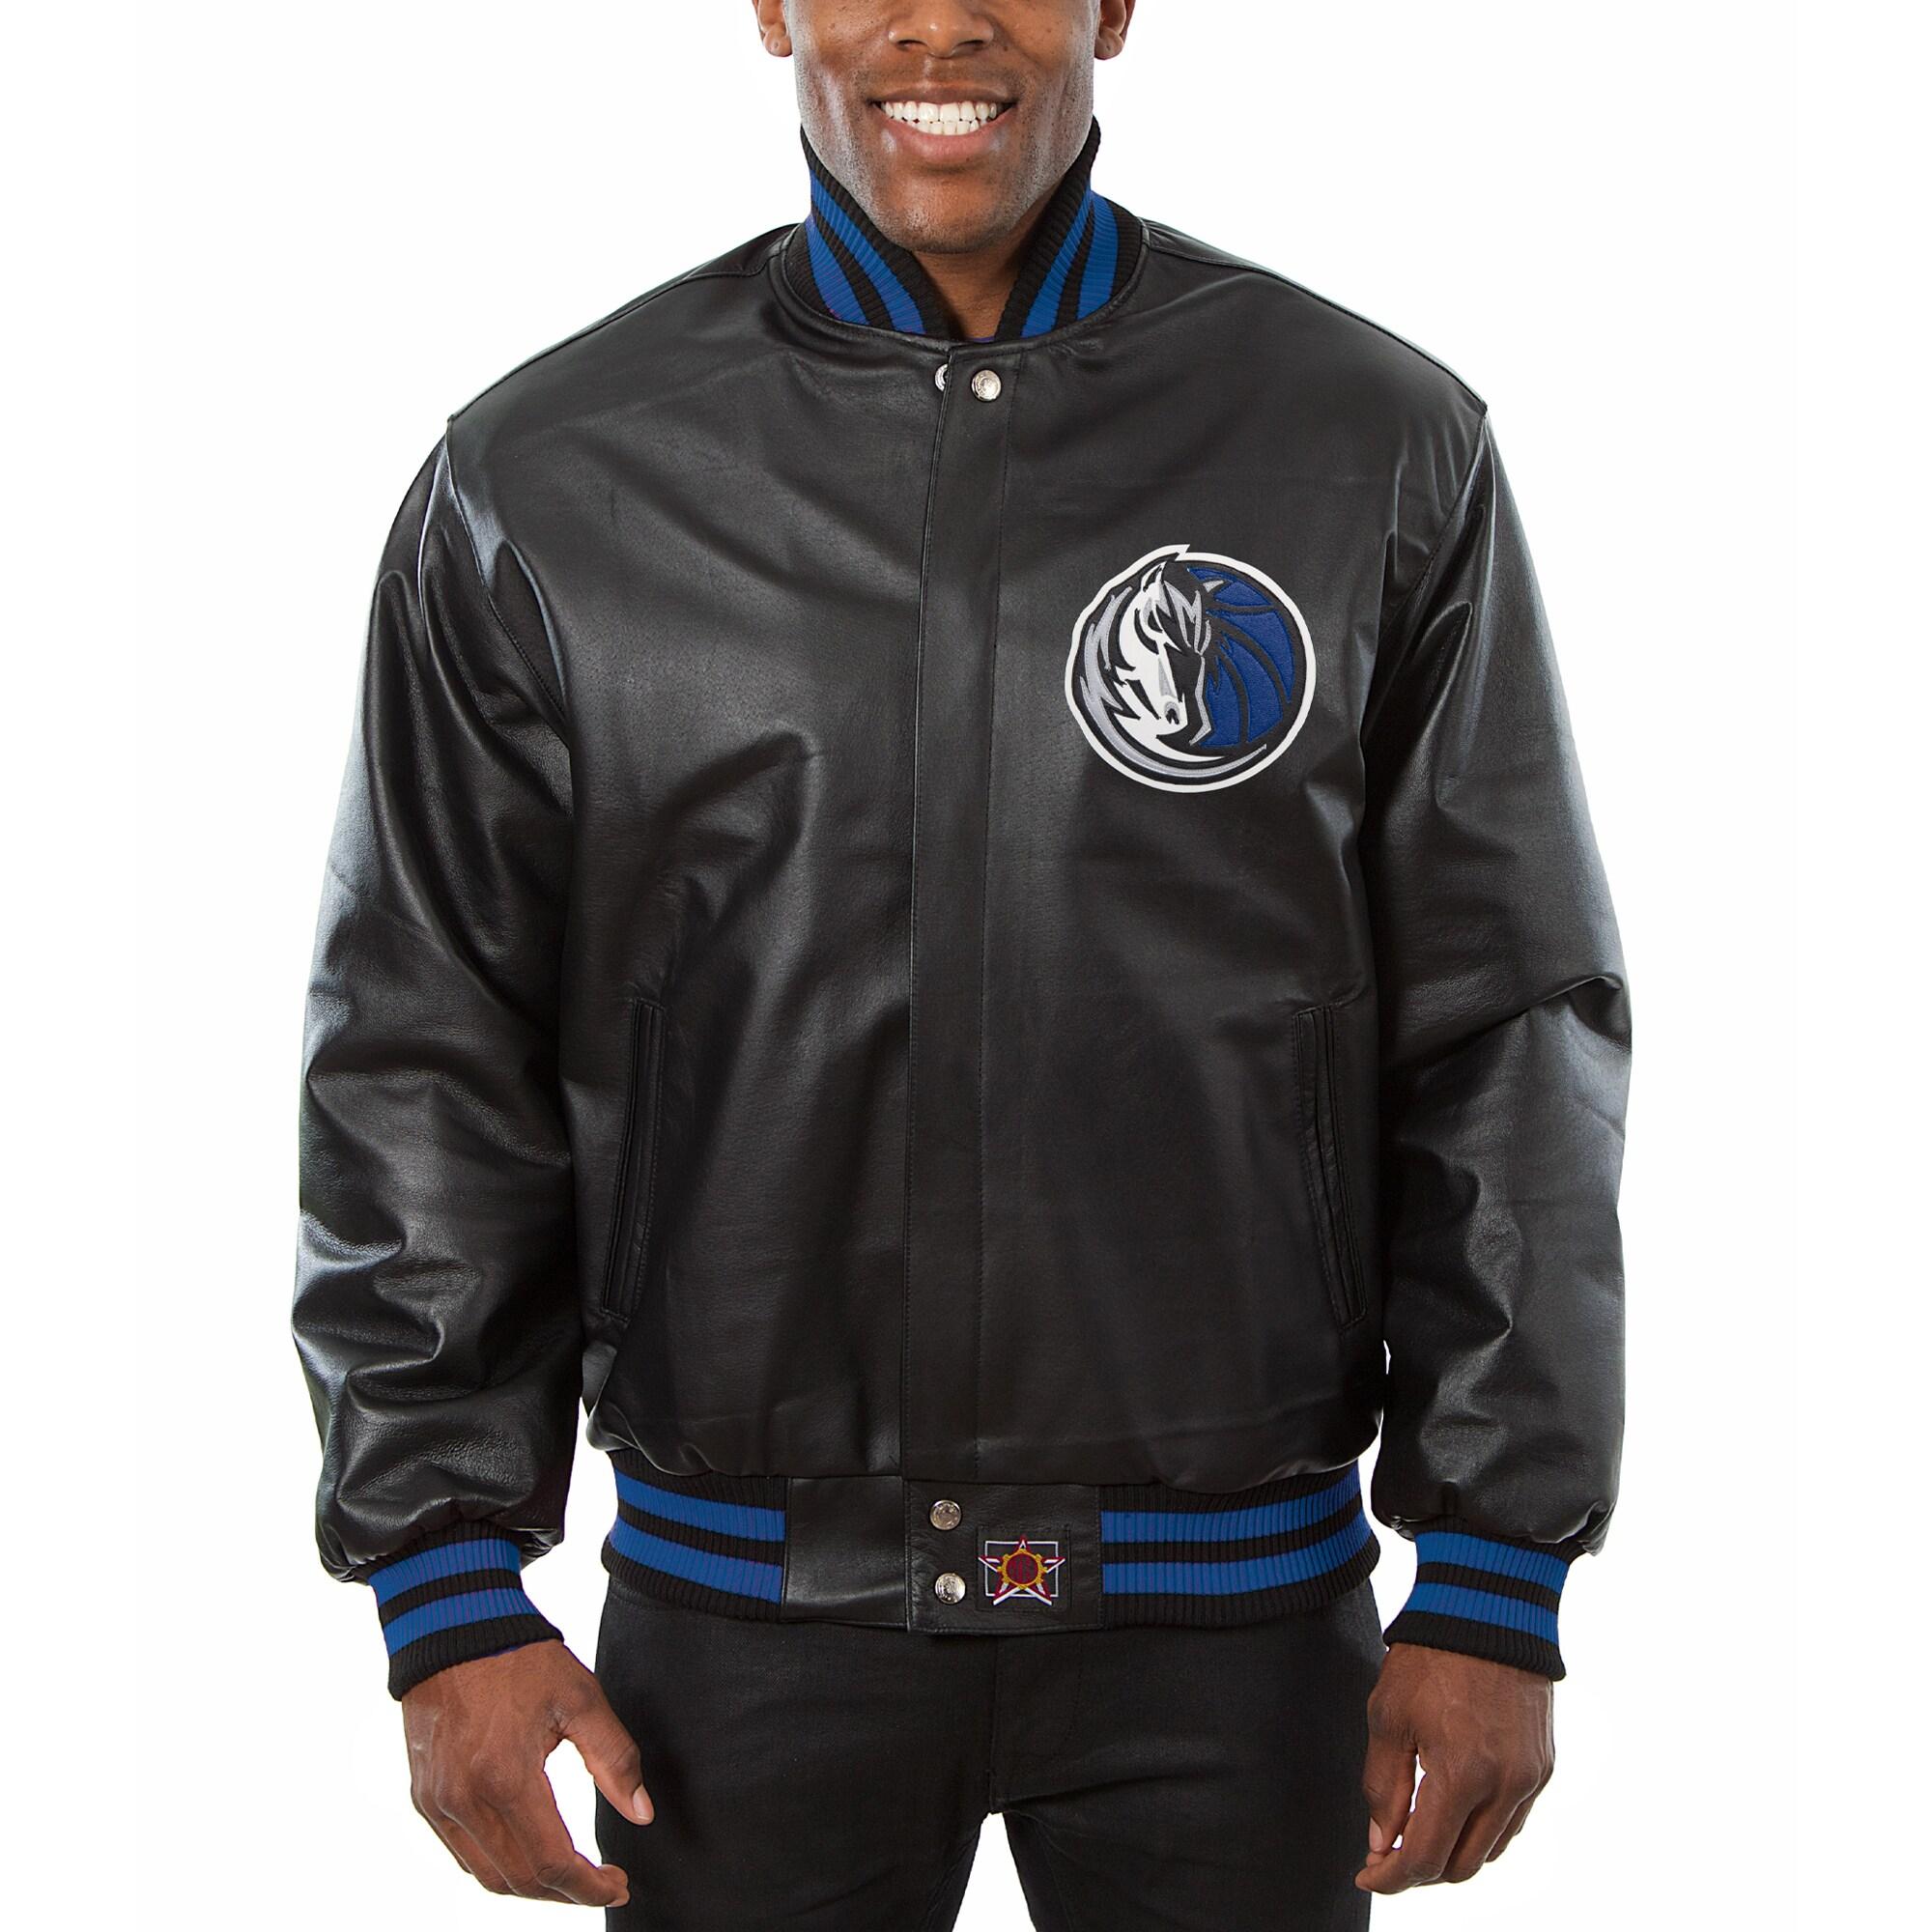 Dallas Mavericks JH Design Big & Tall All-Leather Full-Snap Jacket - Black